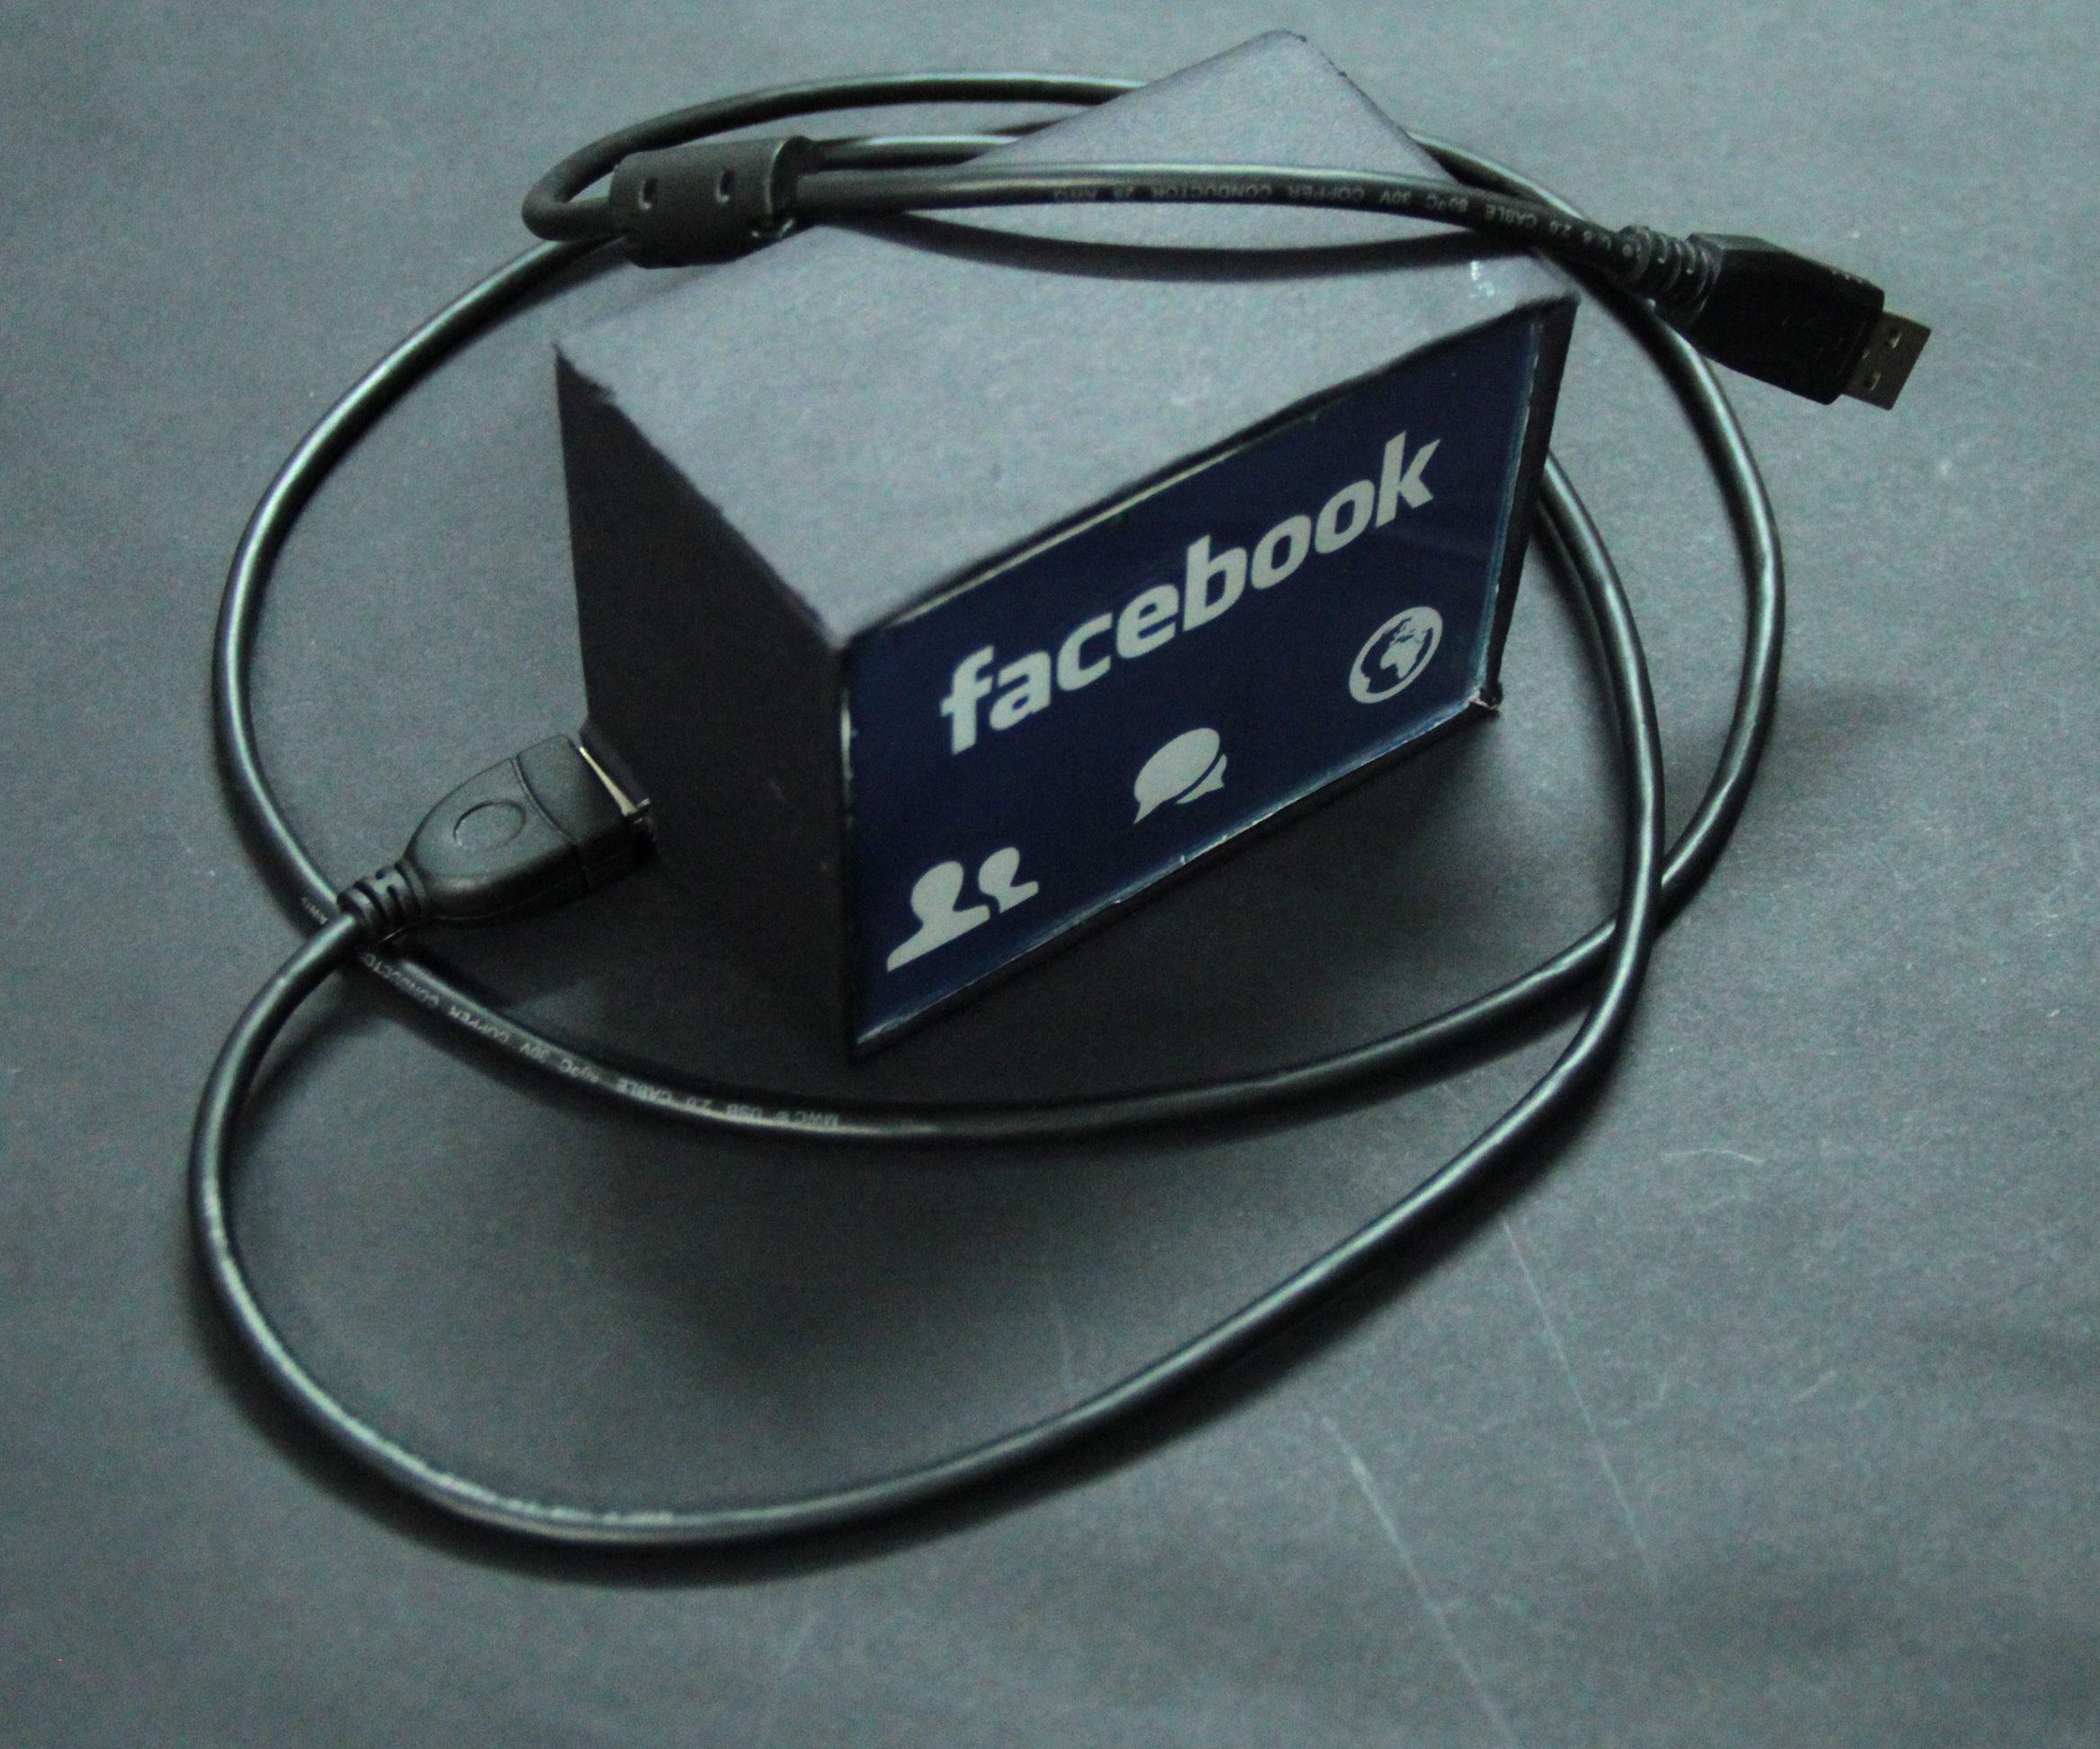 Facebook Notifier - Project Geek #2